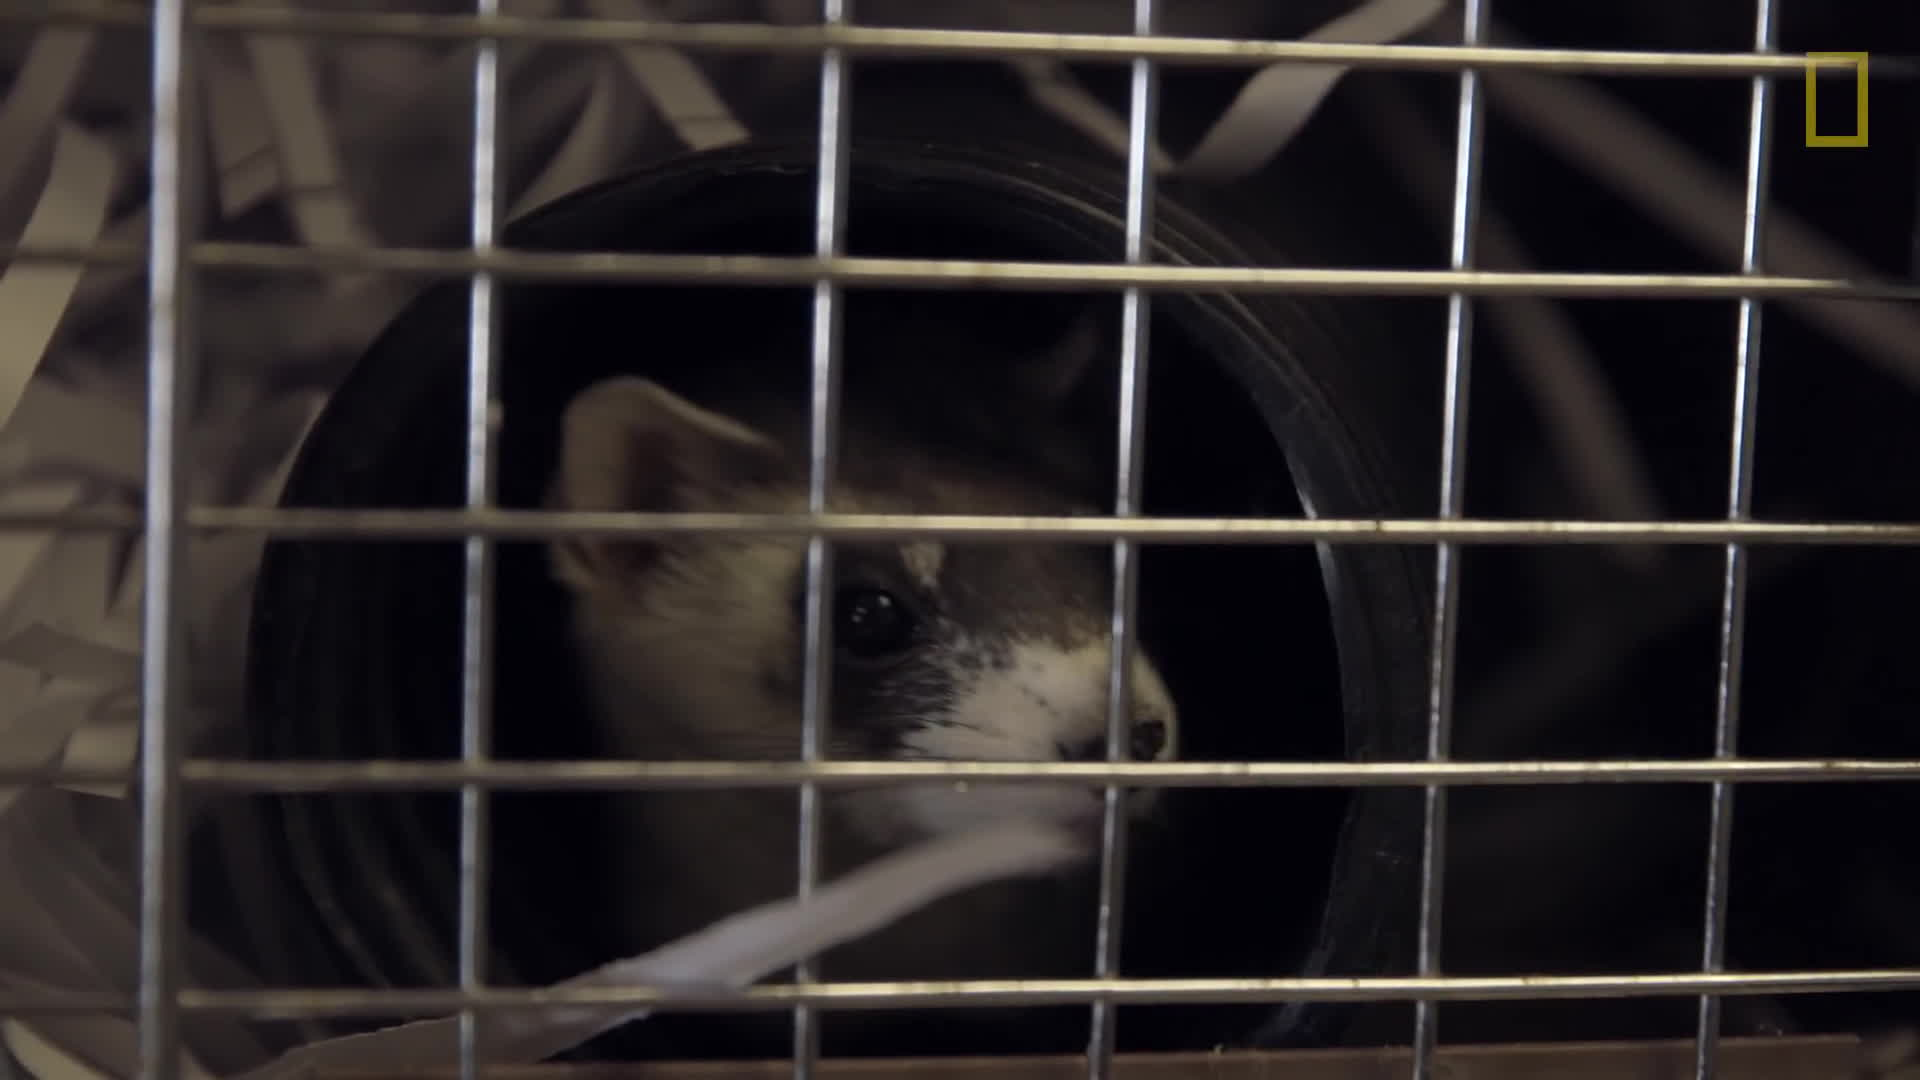 endangered, ferrets, gifs, Harsh Reality of Saving Endangered Ferrets GIFs